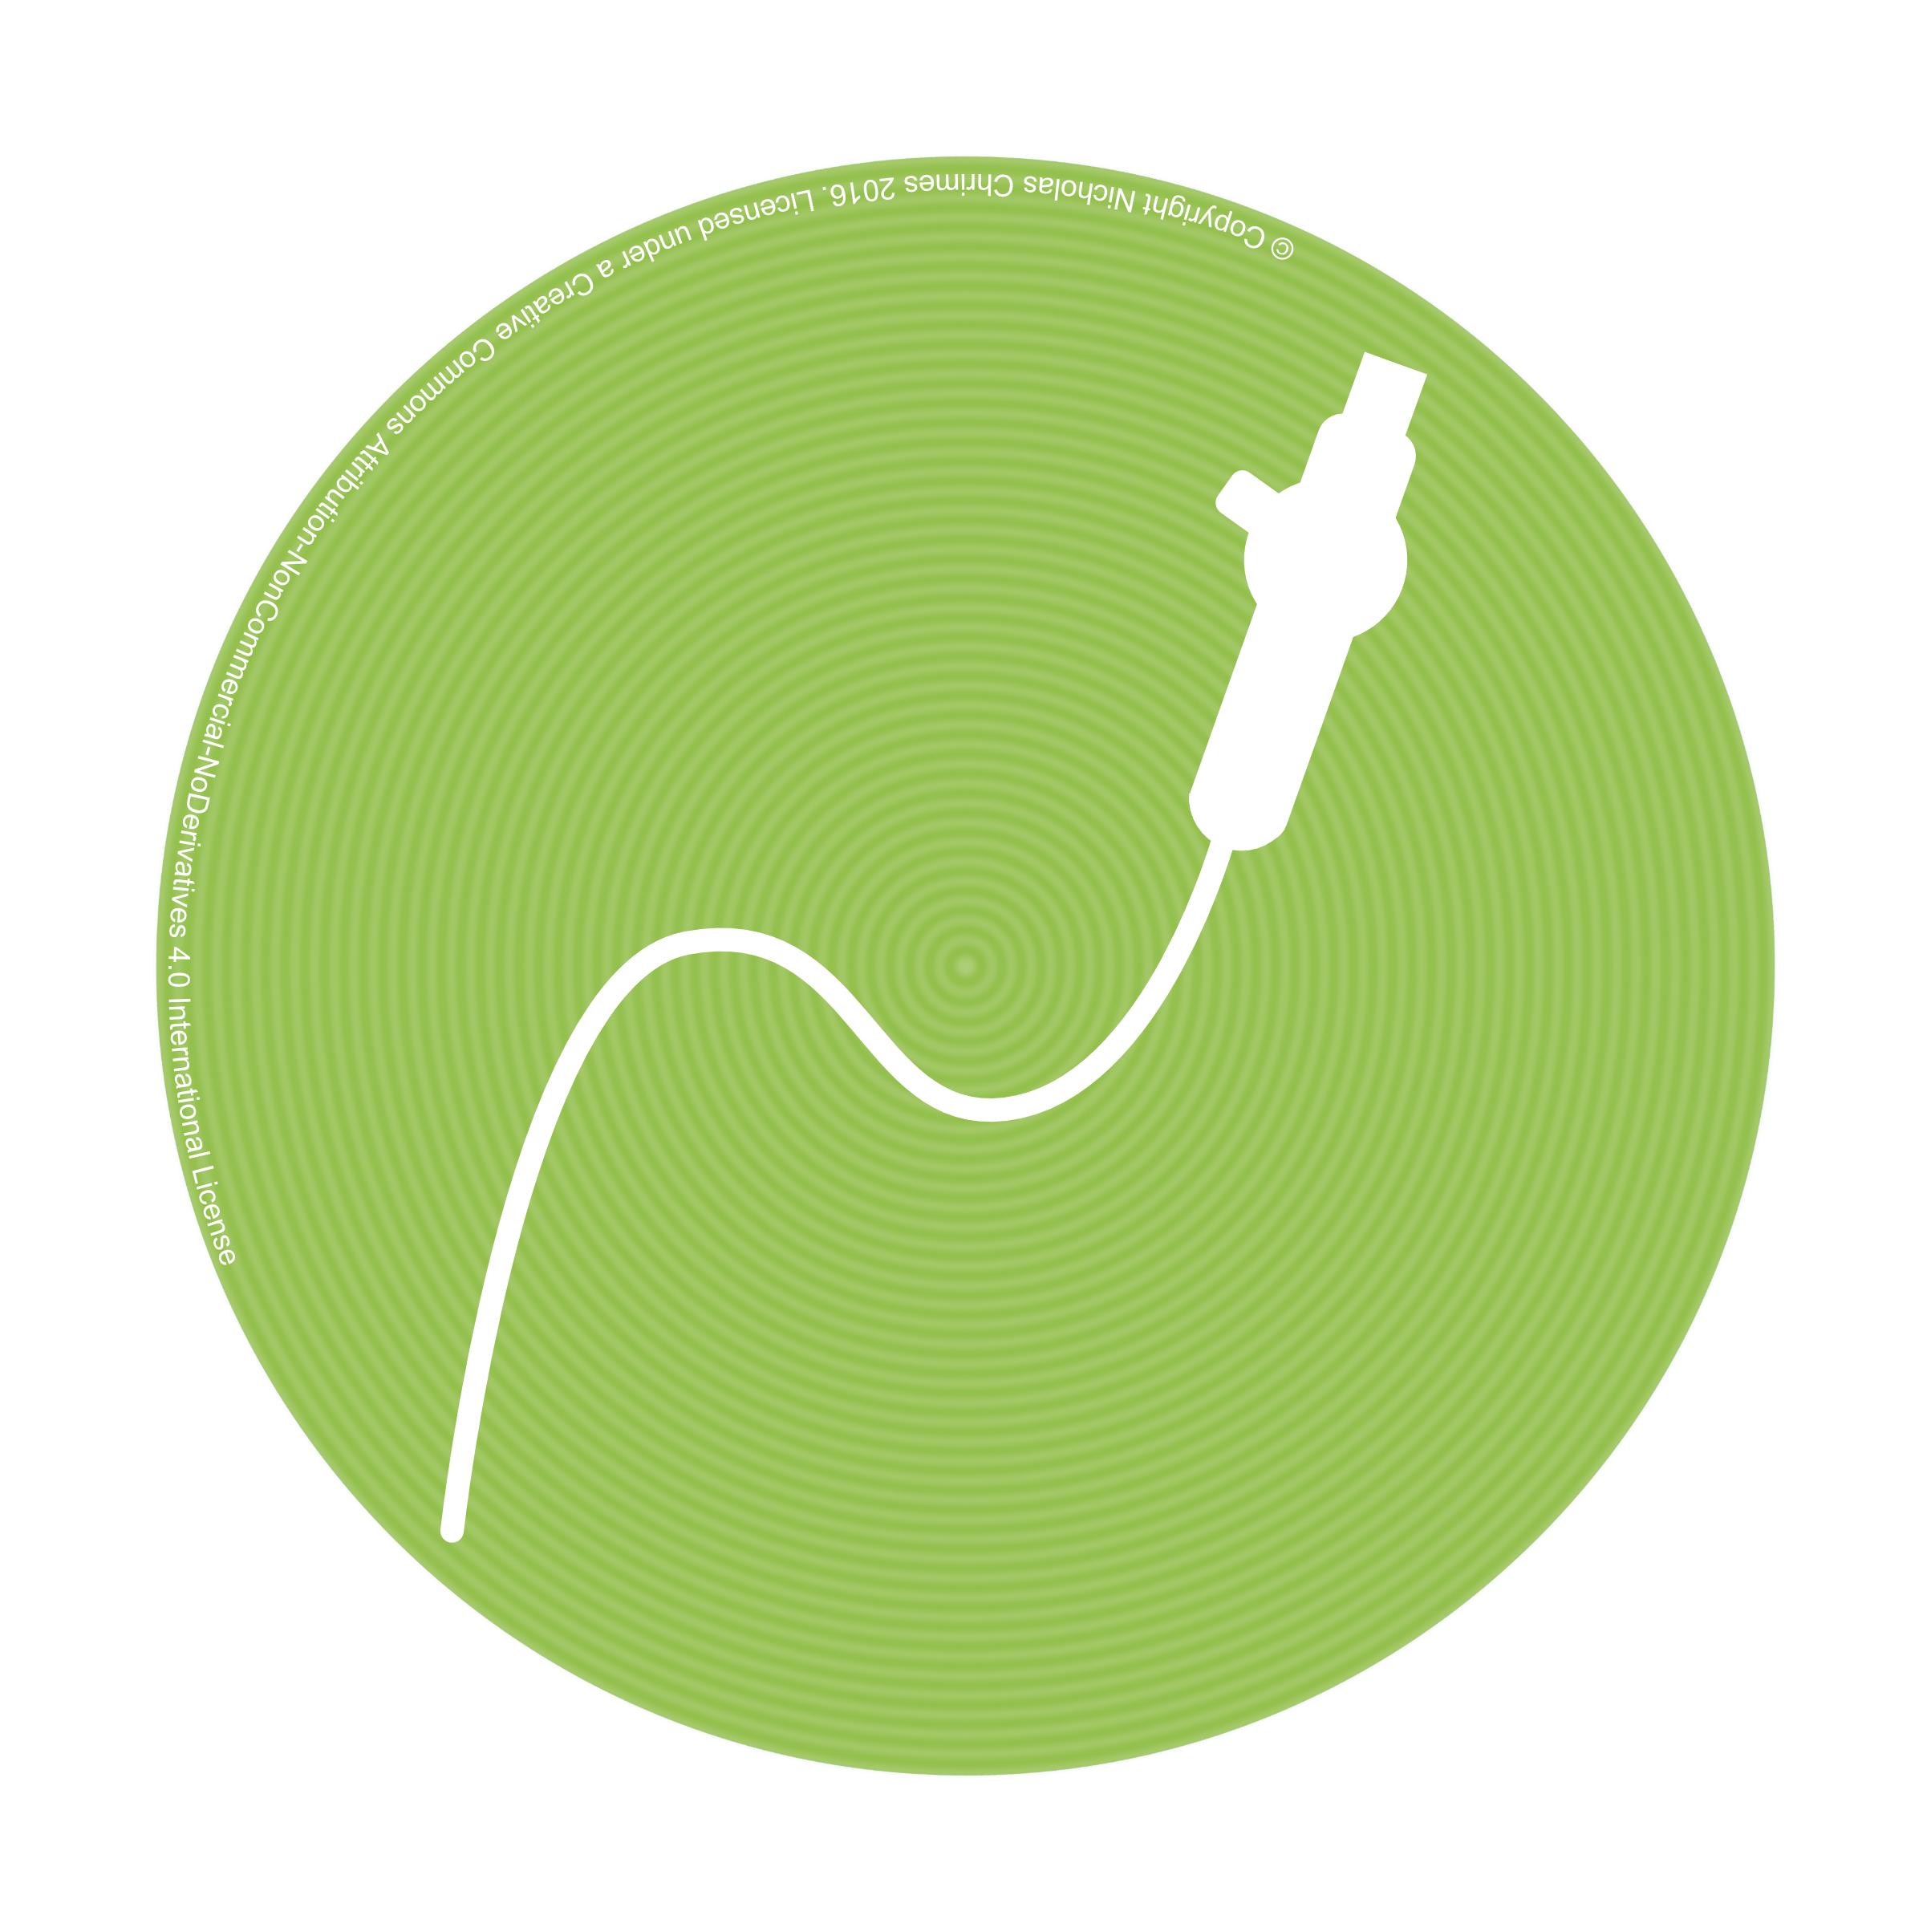 Endoscope Icon